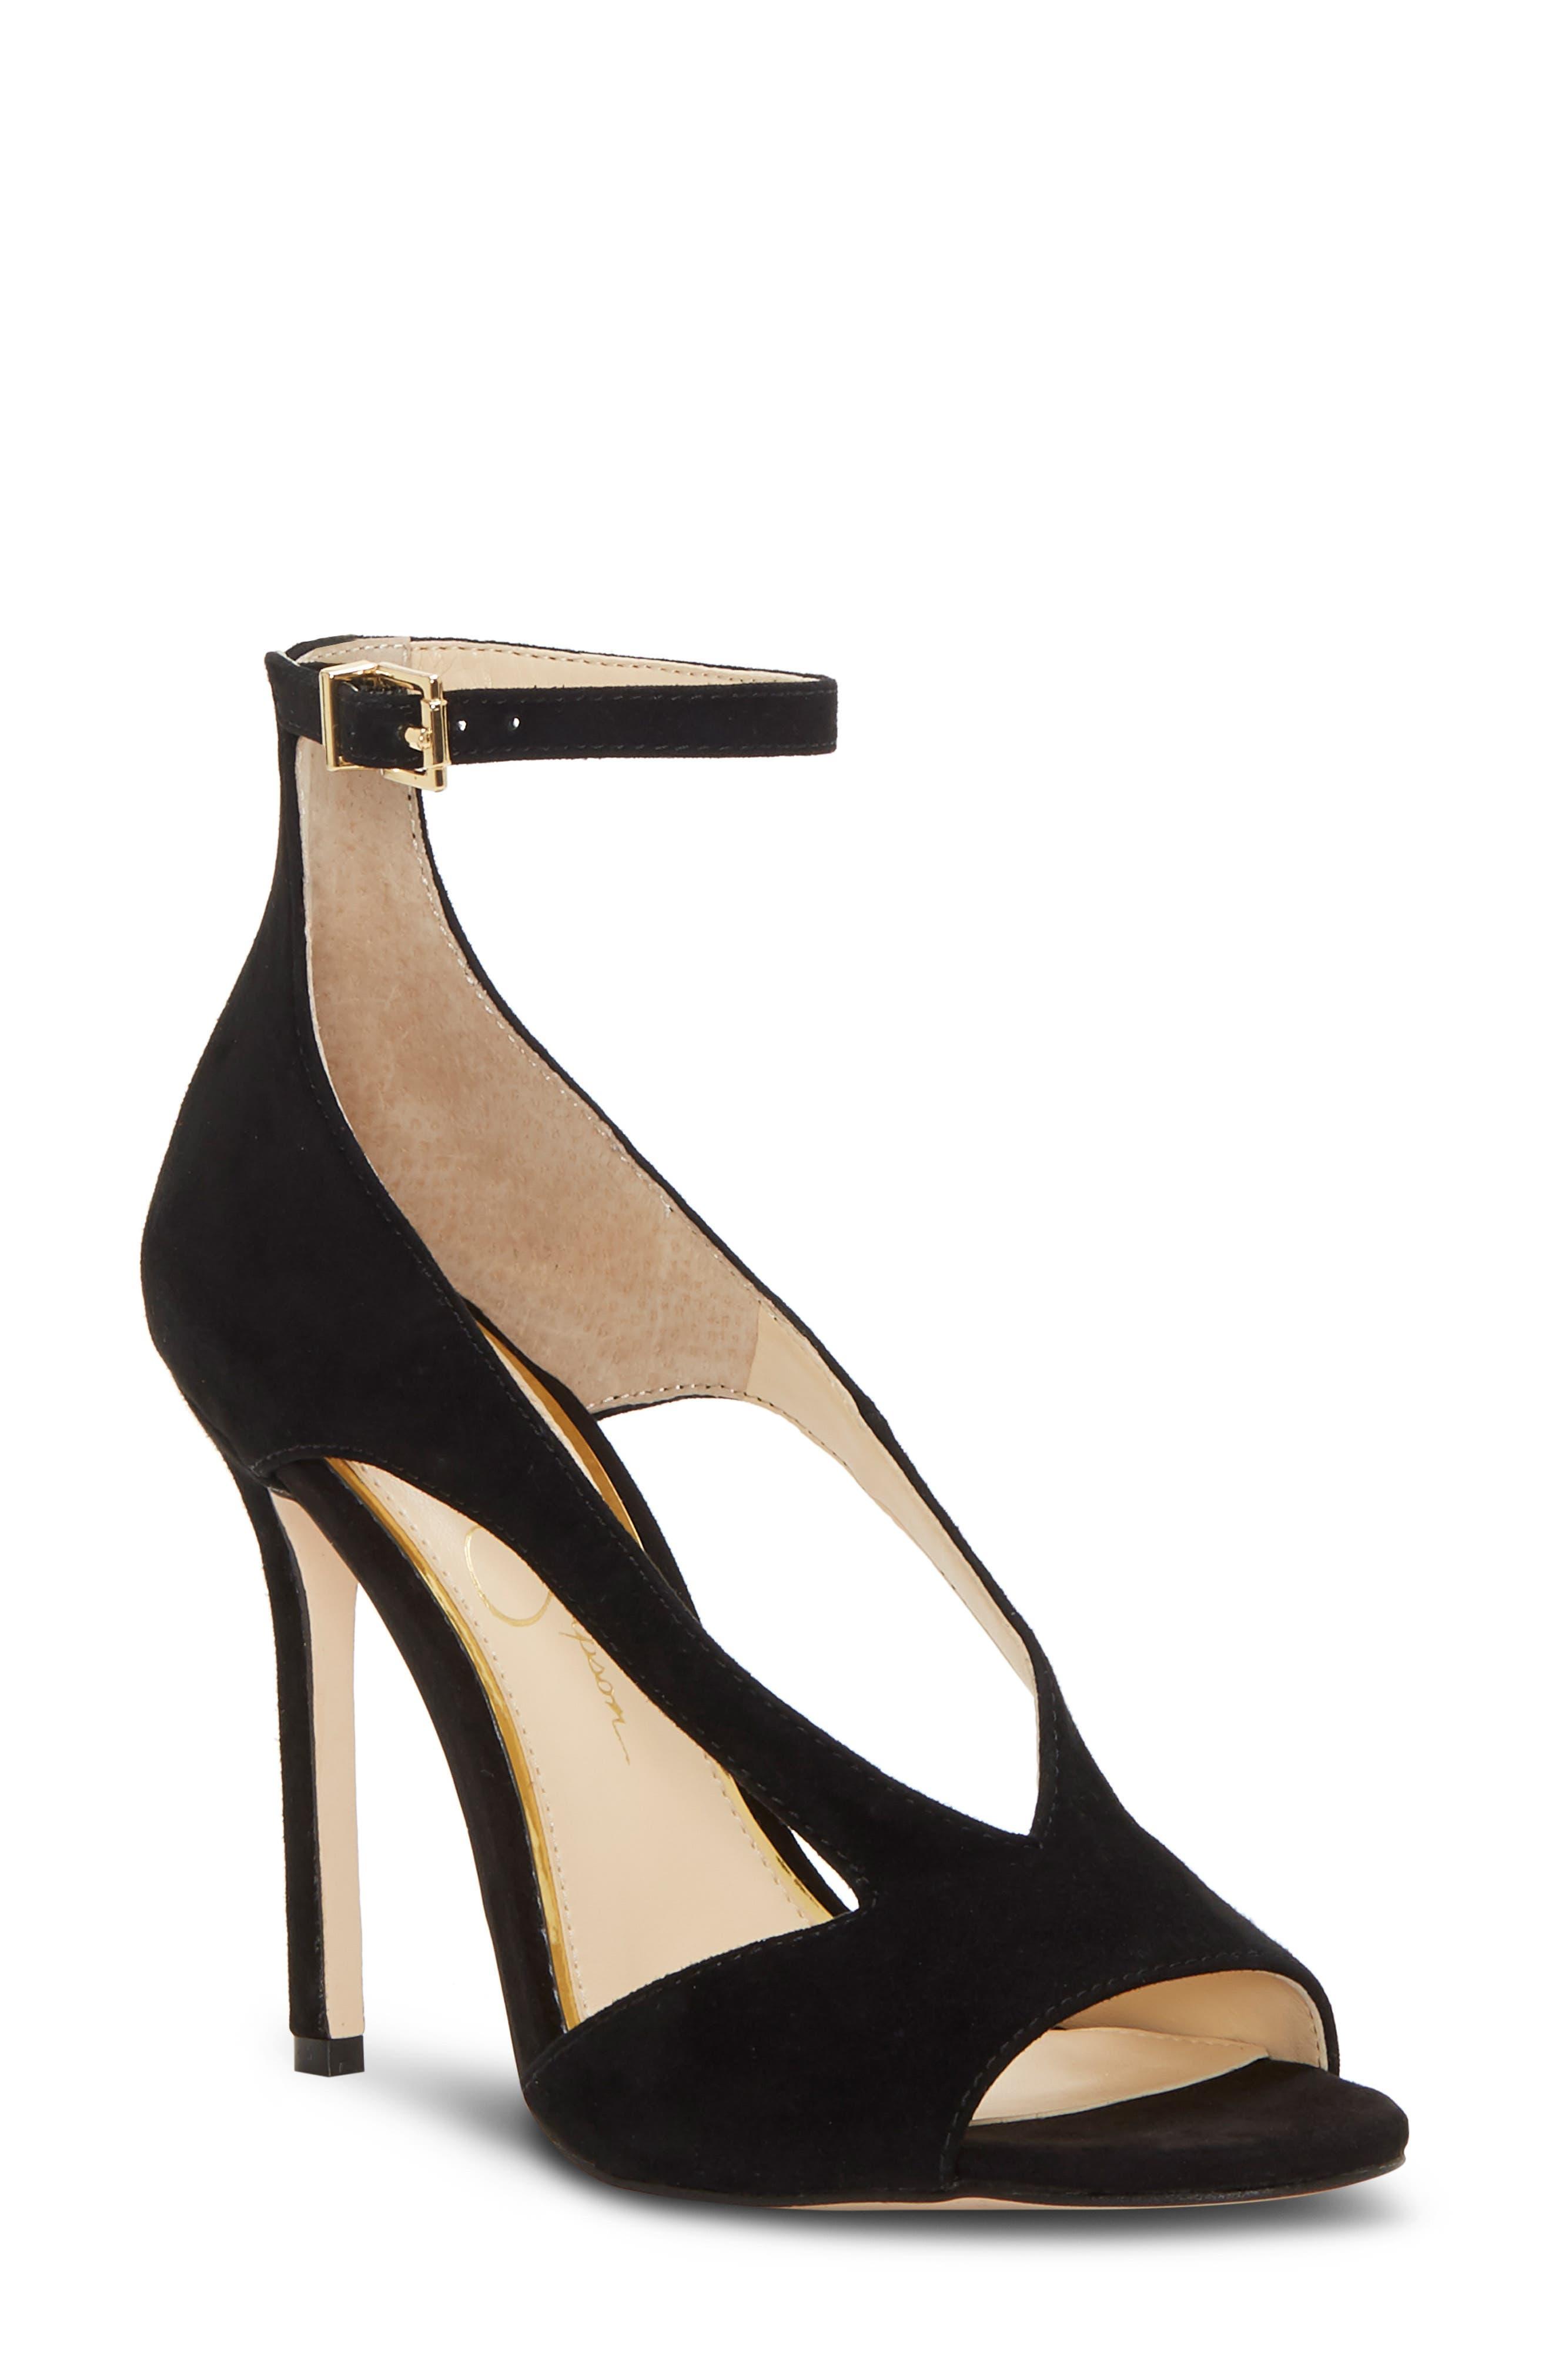 Jessica Simpson Jasta Ankle Strap Sandal- Black